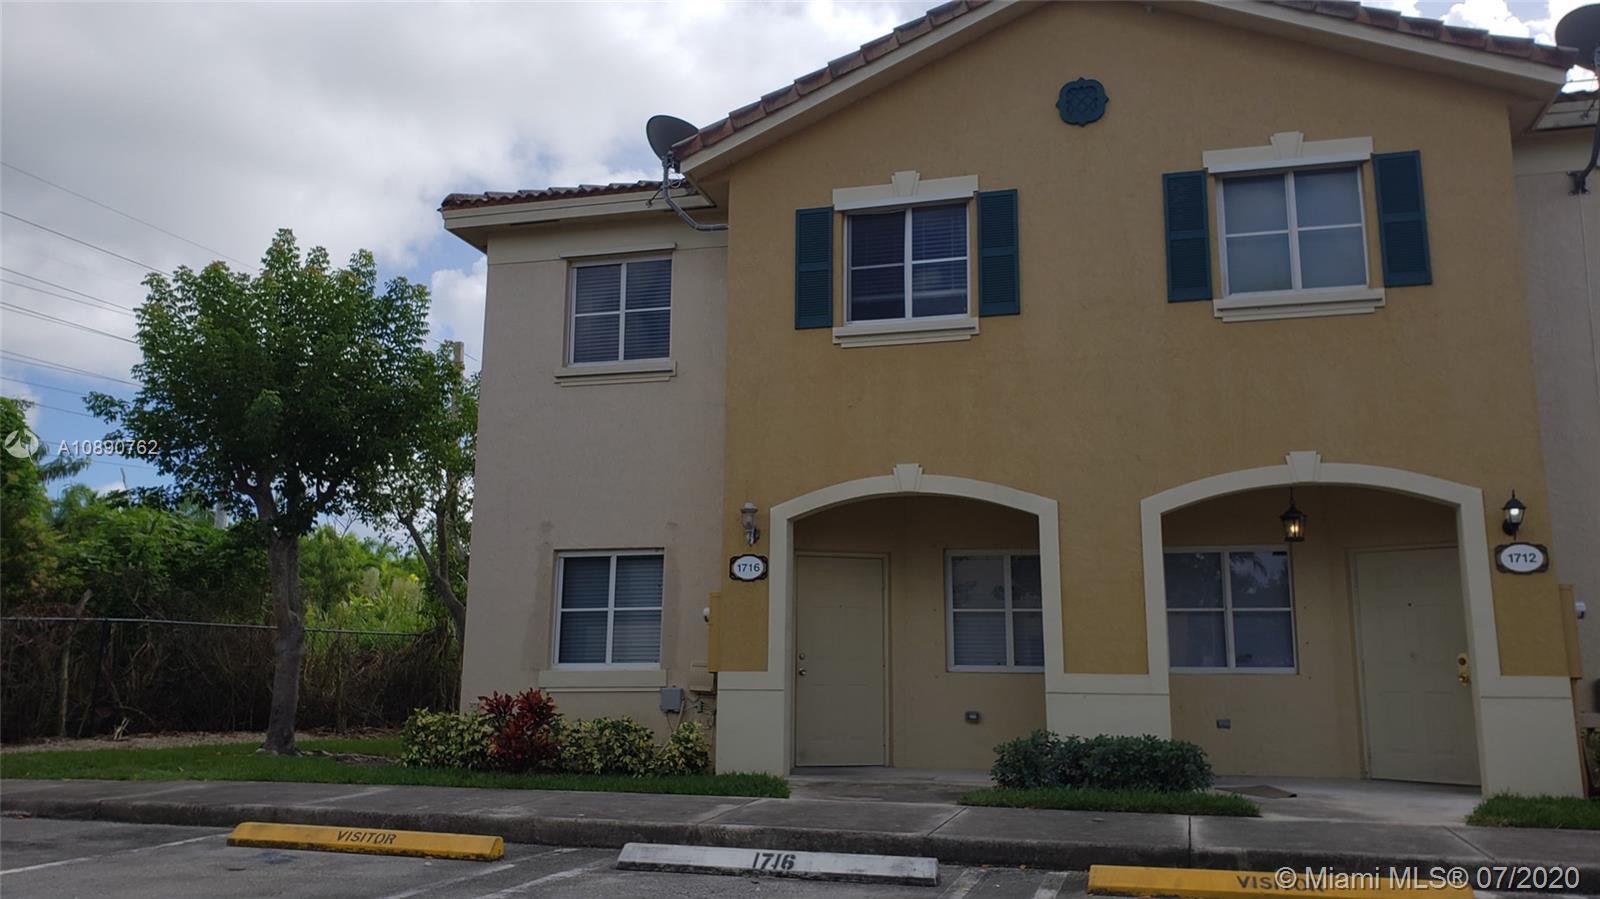 1716 SE 31st Ct Property Photo